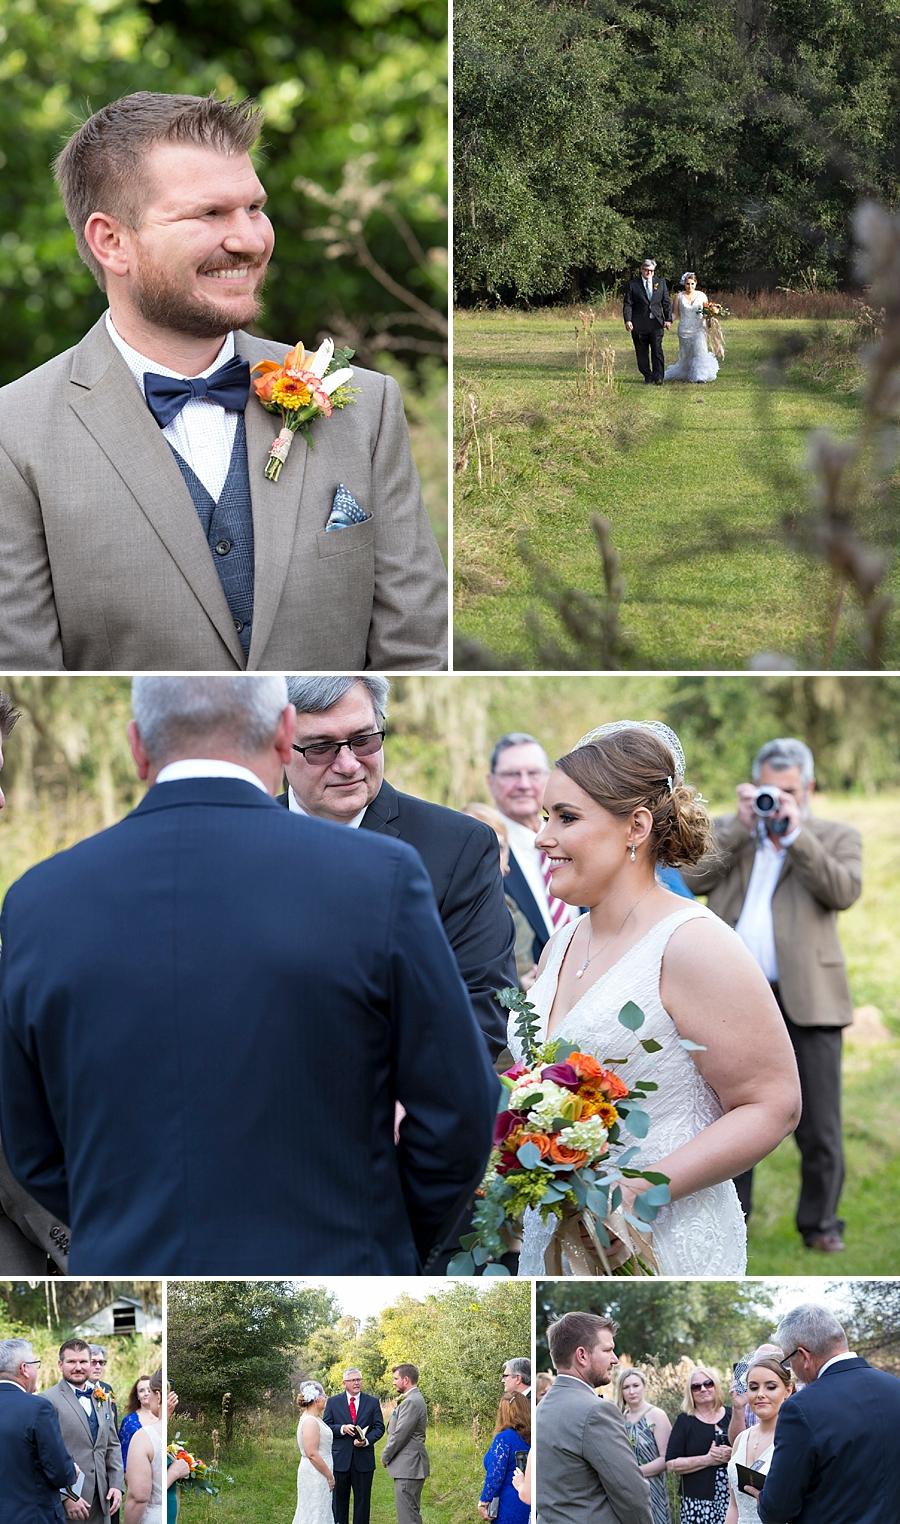 paynes prairie elopement ceremony